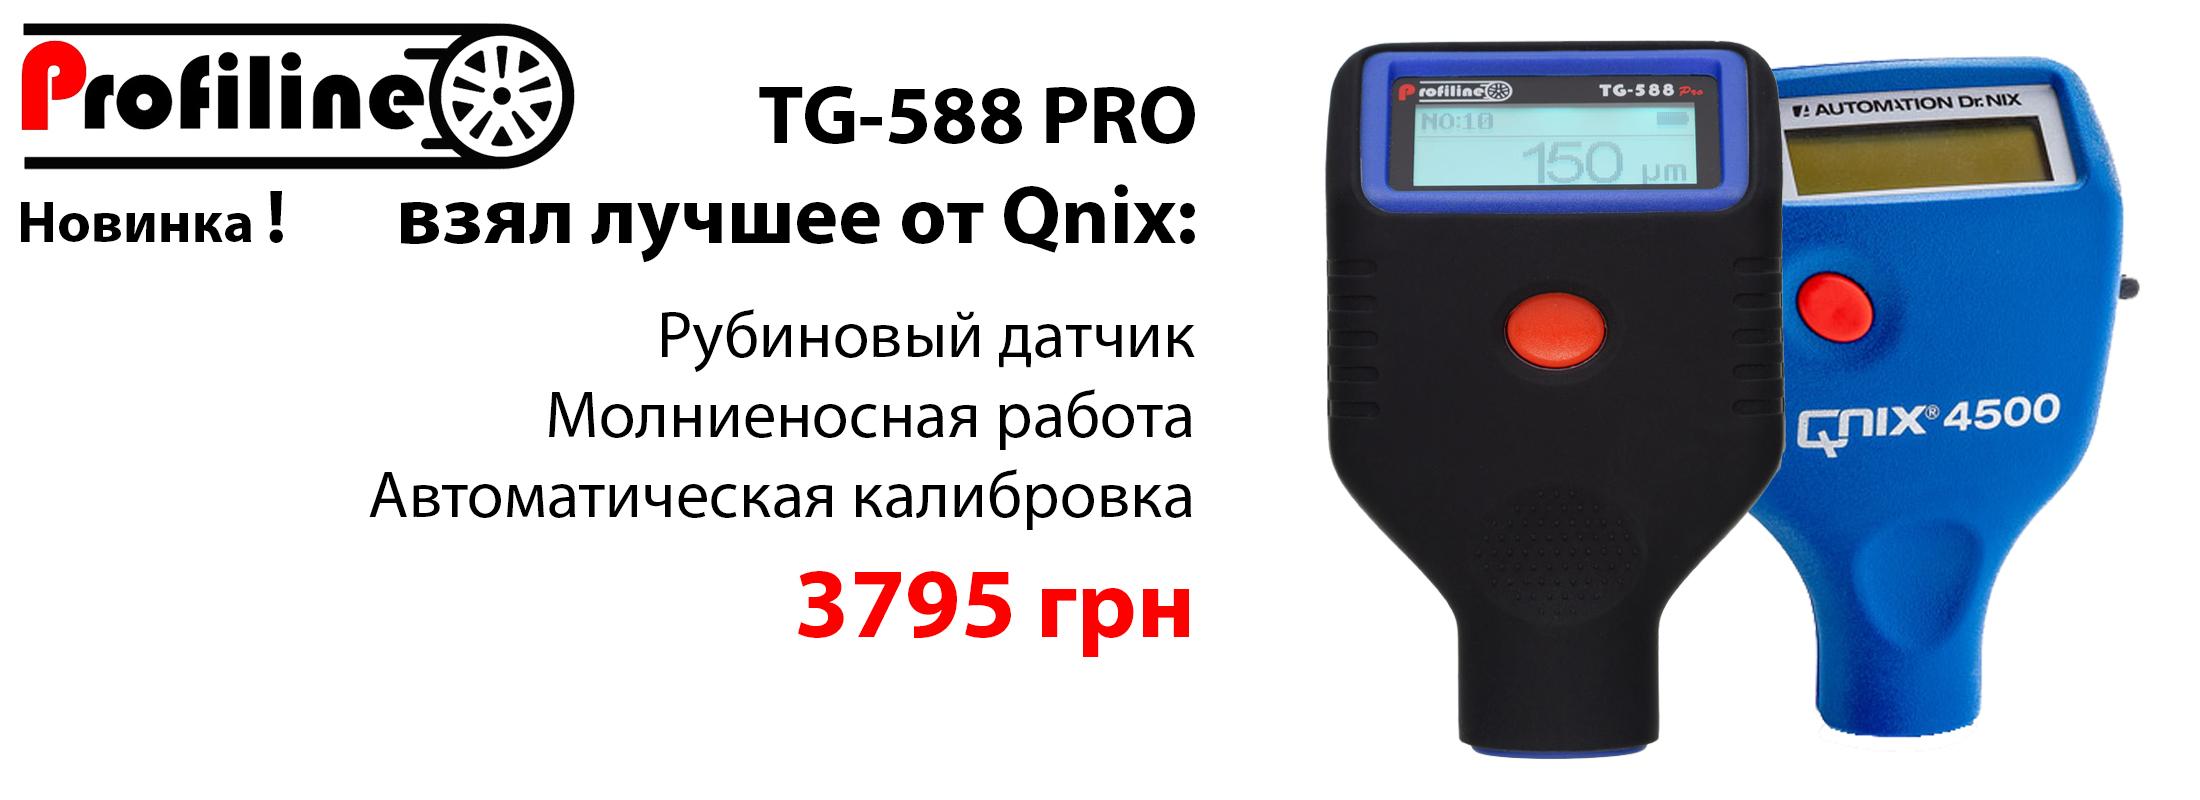 Profiline TG-588 PRO